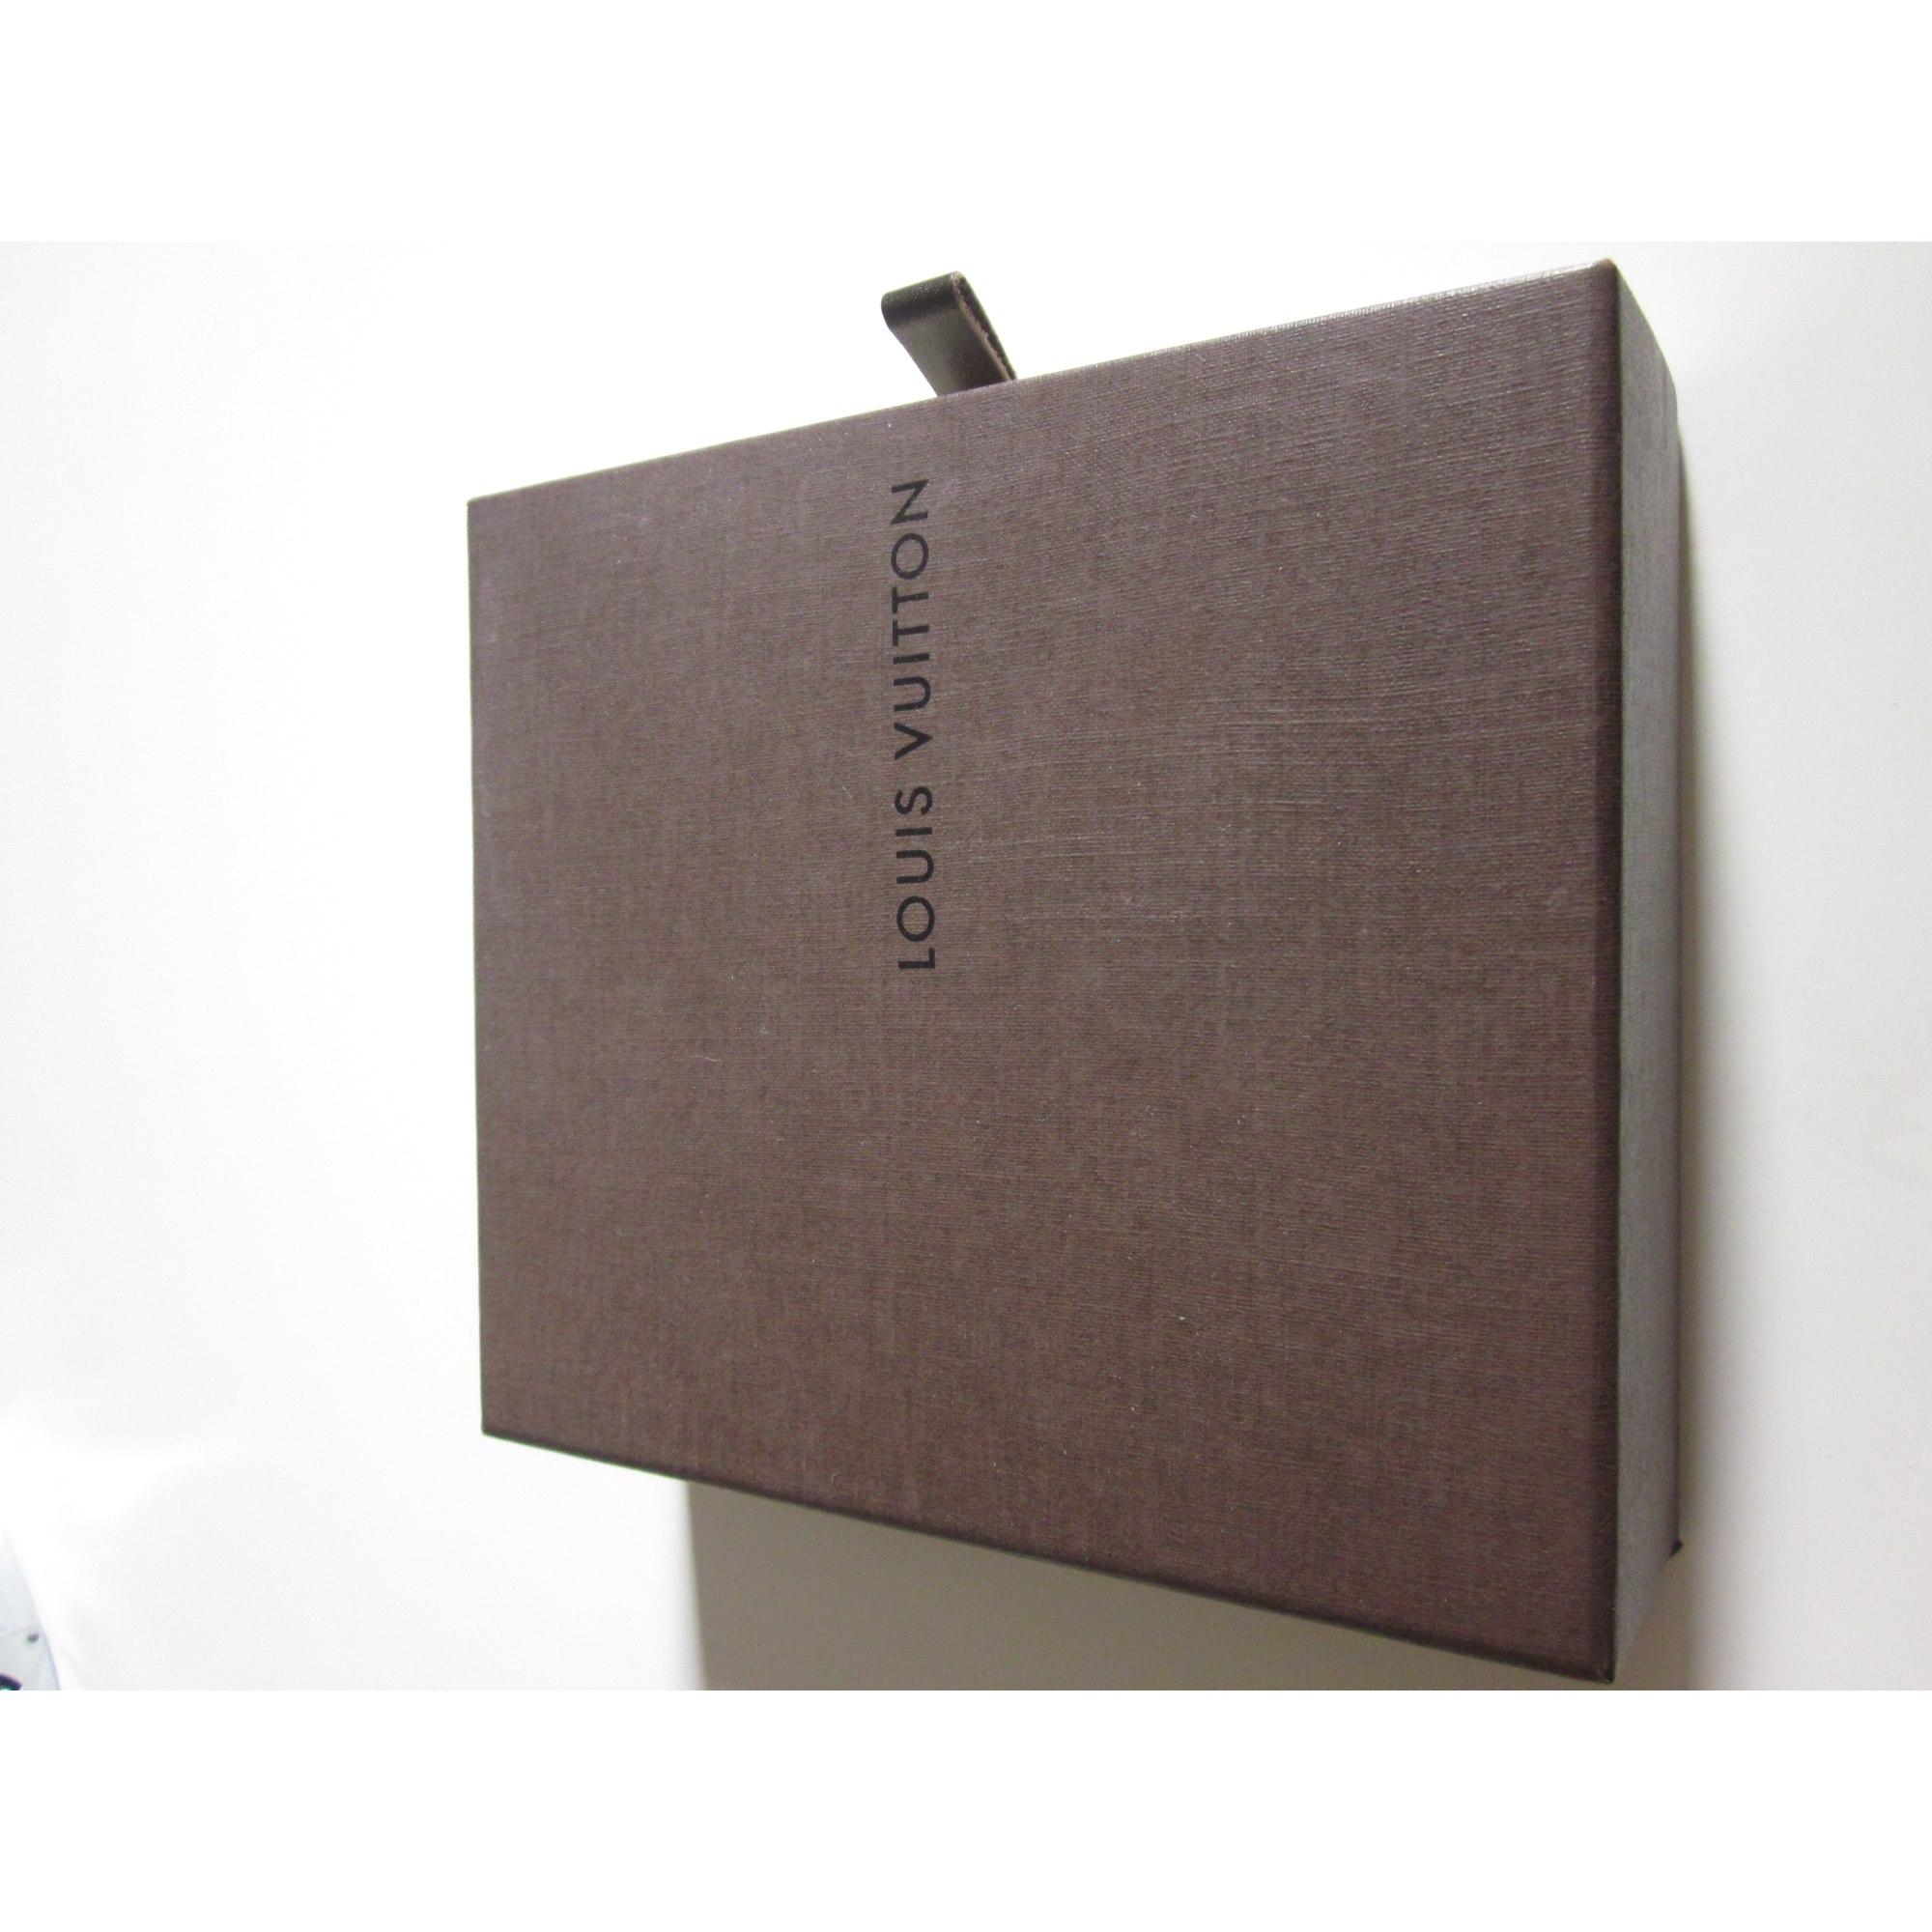 schl sseletui louis vuitton gold vendu par sofy16237 1969920. Black Bedroom Furniture Sets. Home Design Ideas